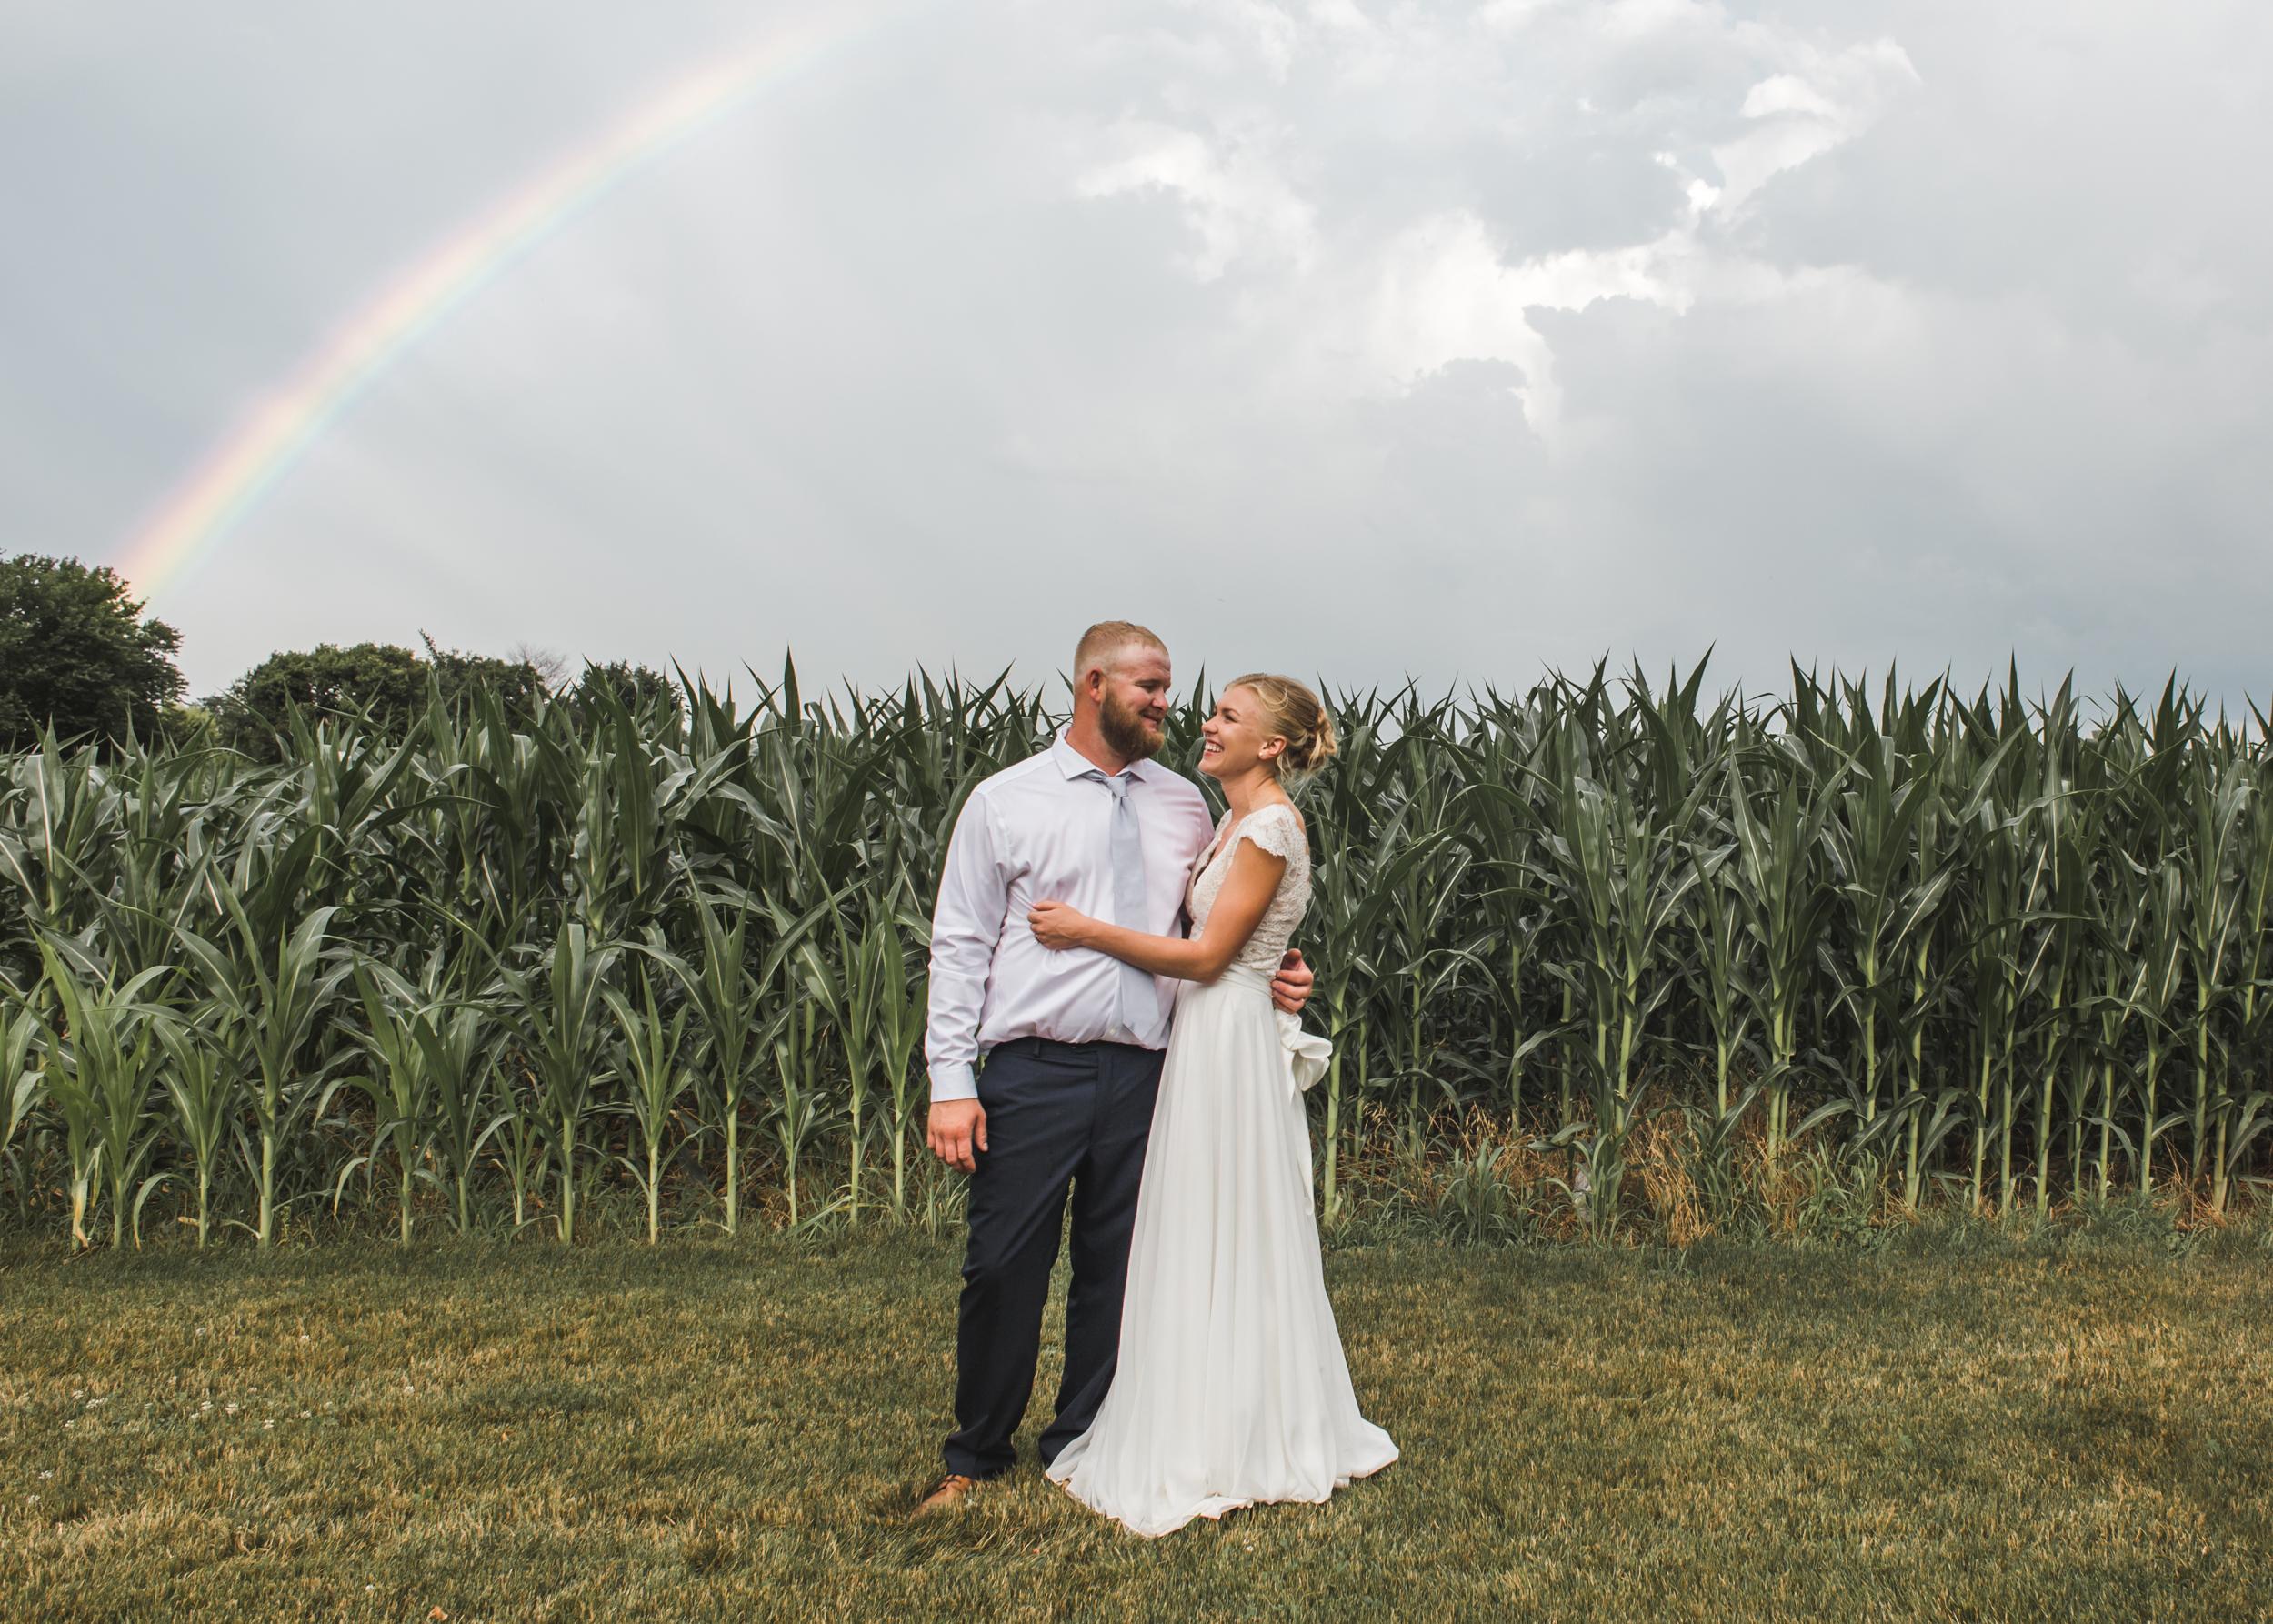 Backyard Michigan Wedding Michigan Wedding Southeast Michigan Wedding Michigan Wedding Photographer Rustic Wedding Simple Wedding